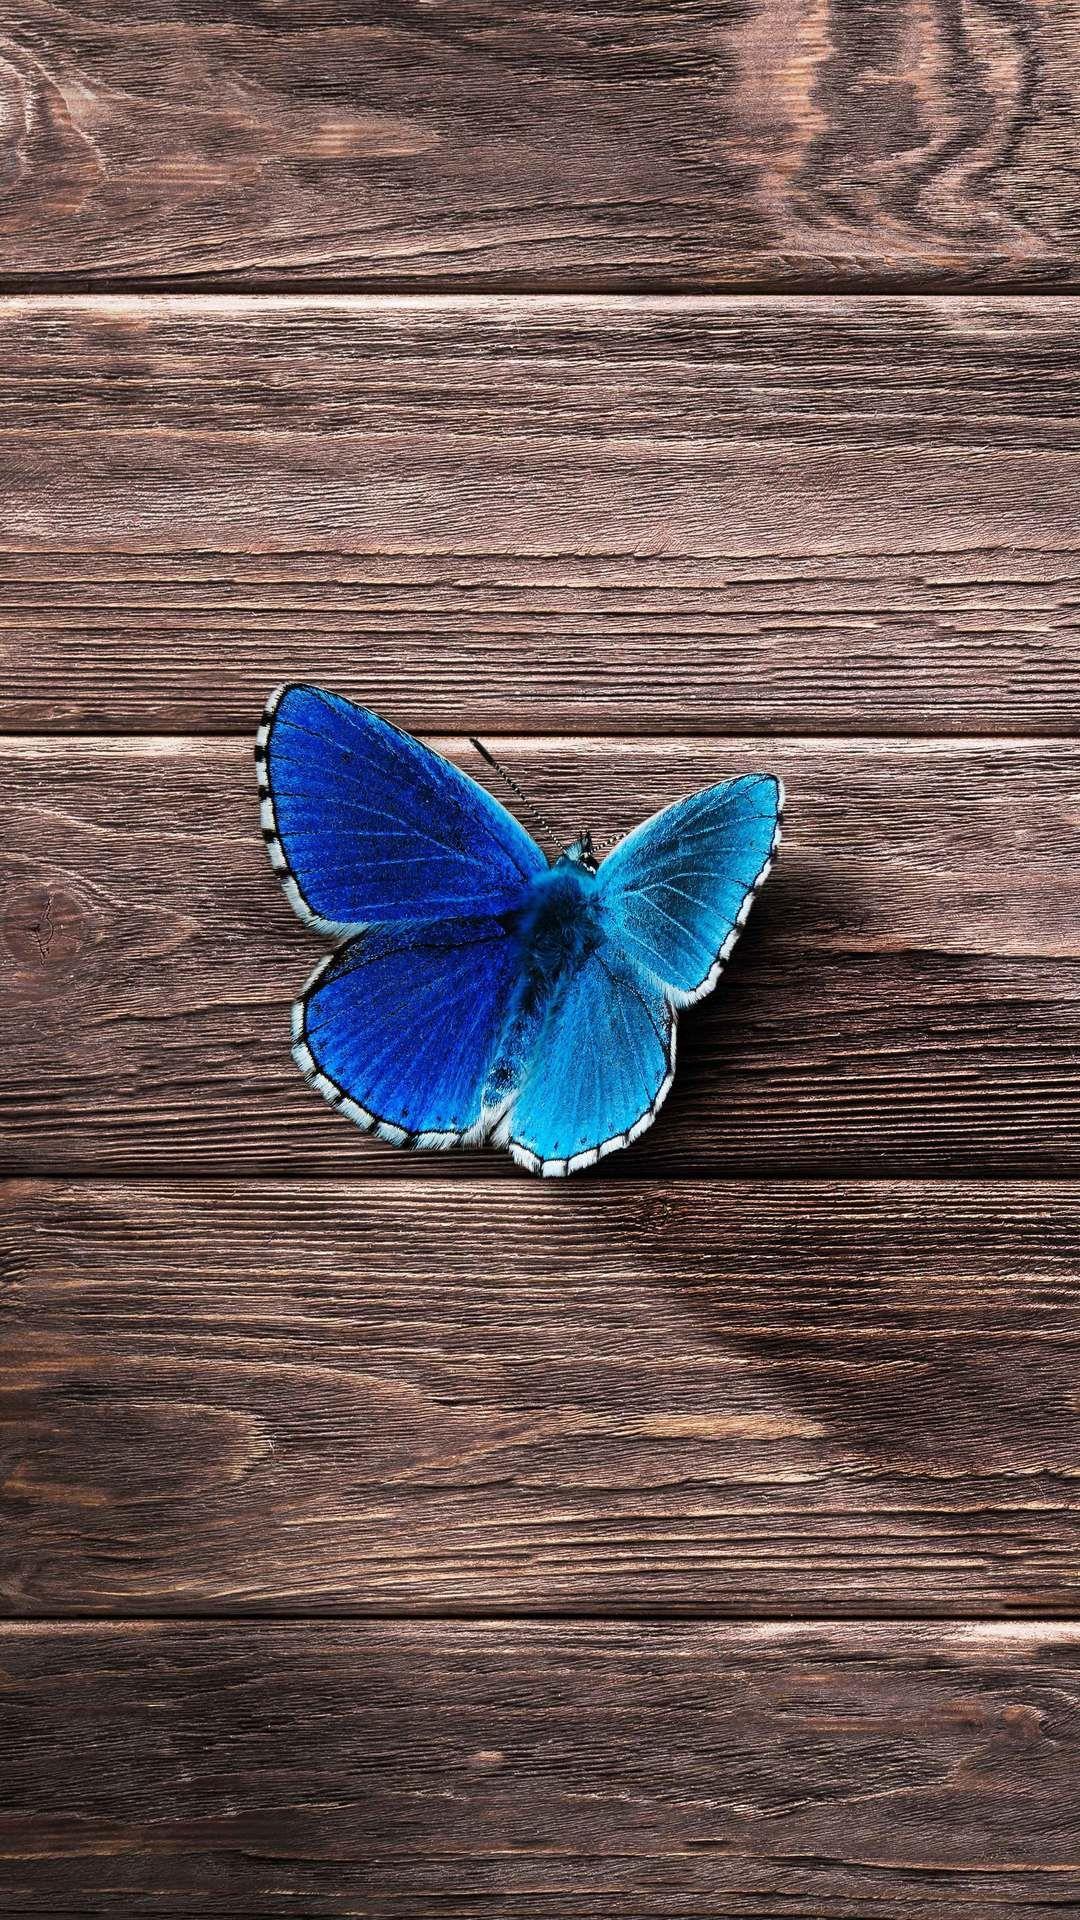 اجمل خلفيات ايفون 7 عالية الدقة 2018 Iphone 7 Hd Wallpapers Tecnologis Butterfly Wallpaper Butterfly Wallpaper Iphone Butterfly Pictures